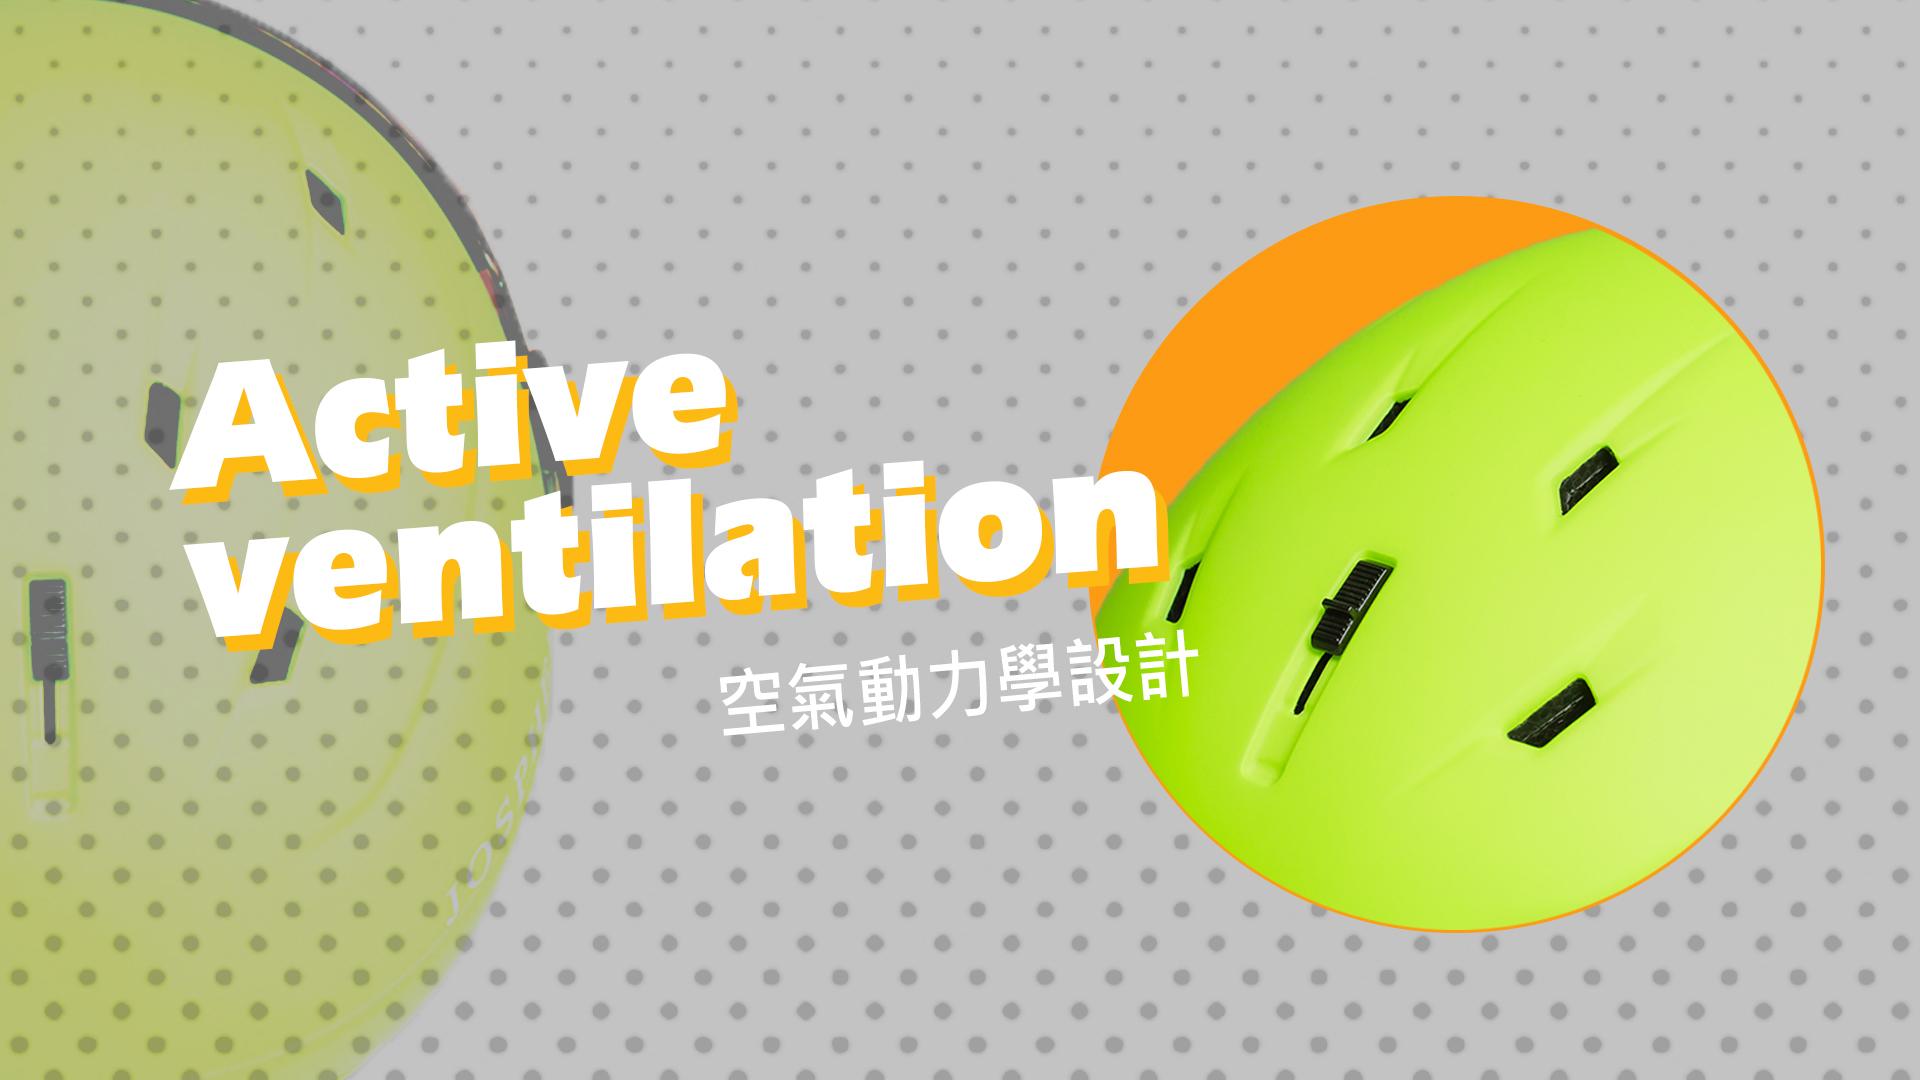 josphere kids helmet active ventilation 空氣動力學設計